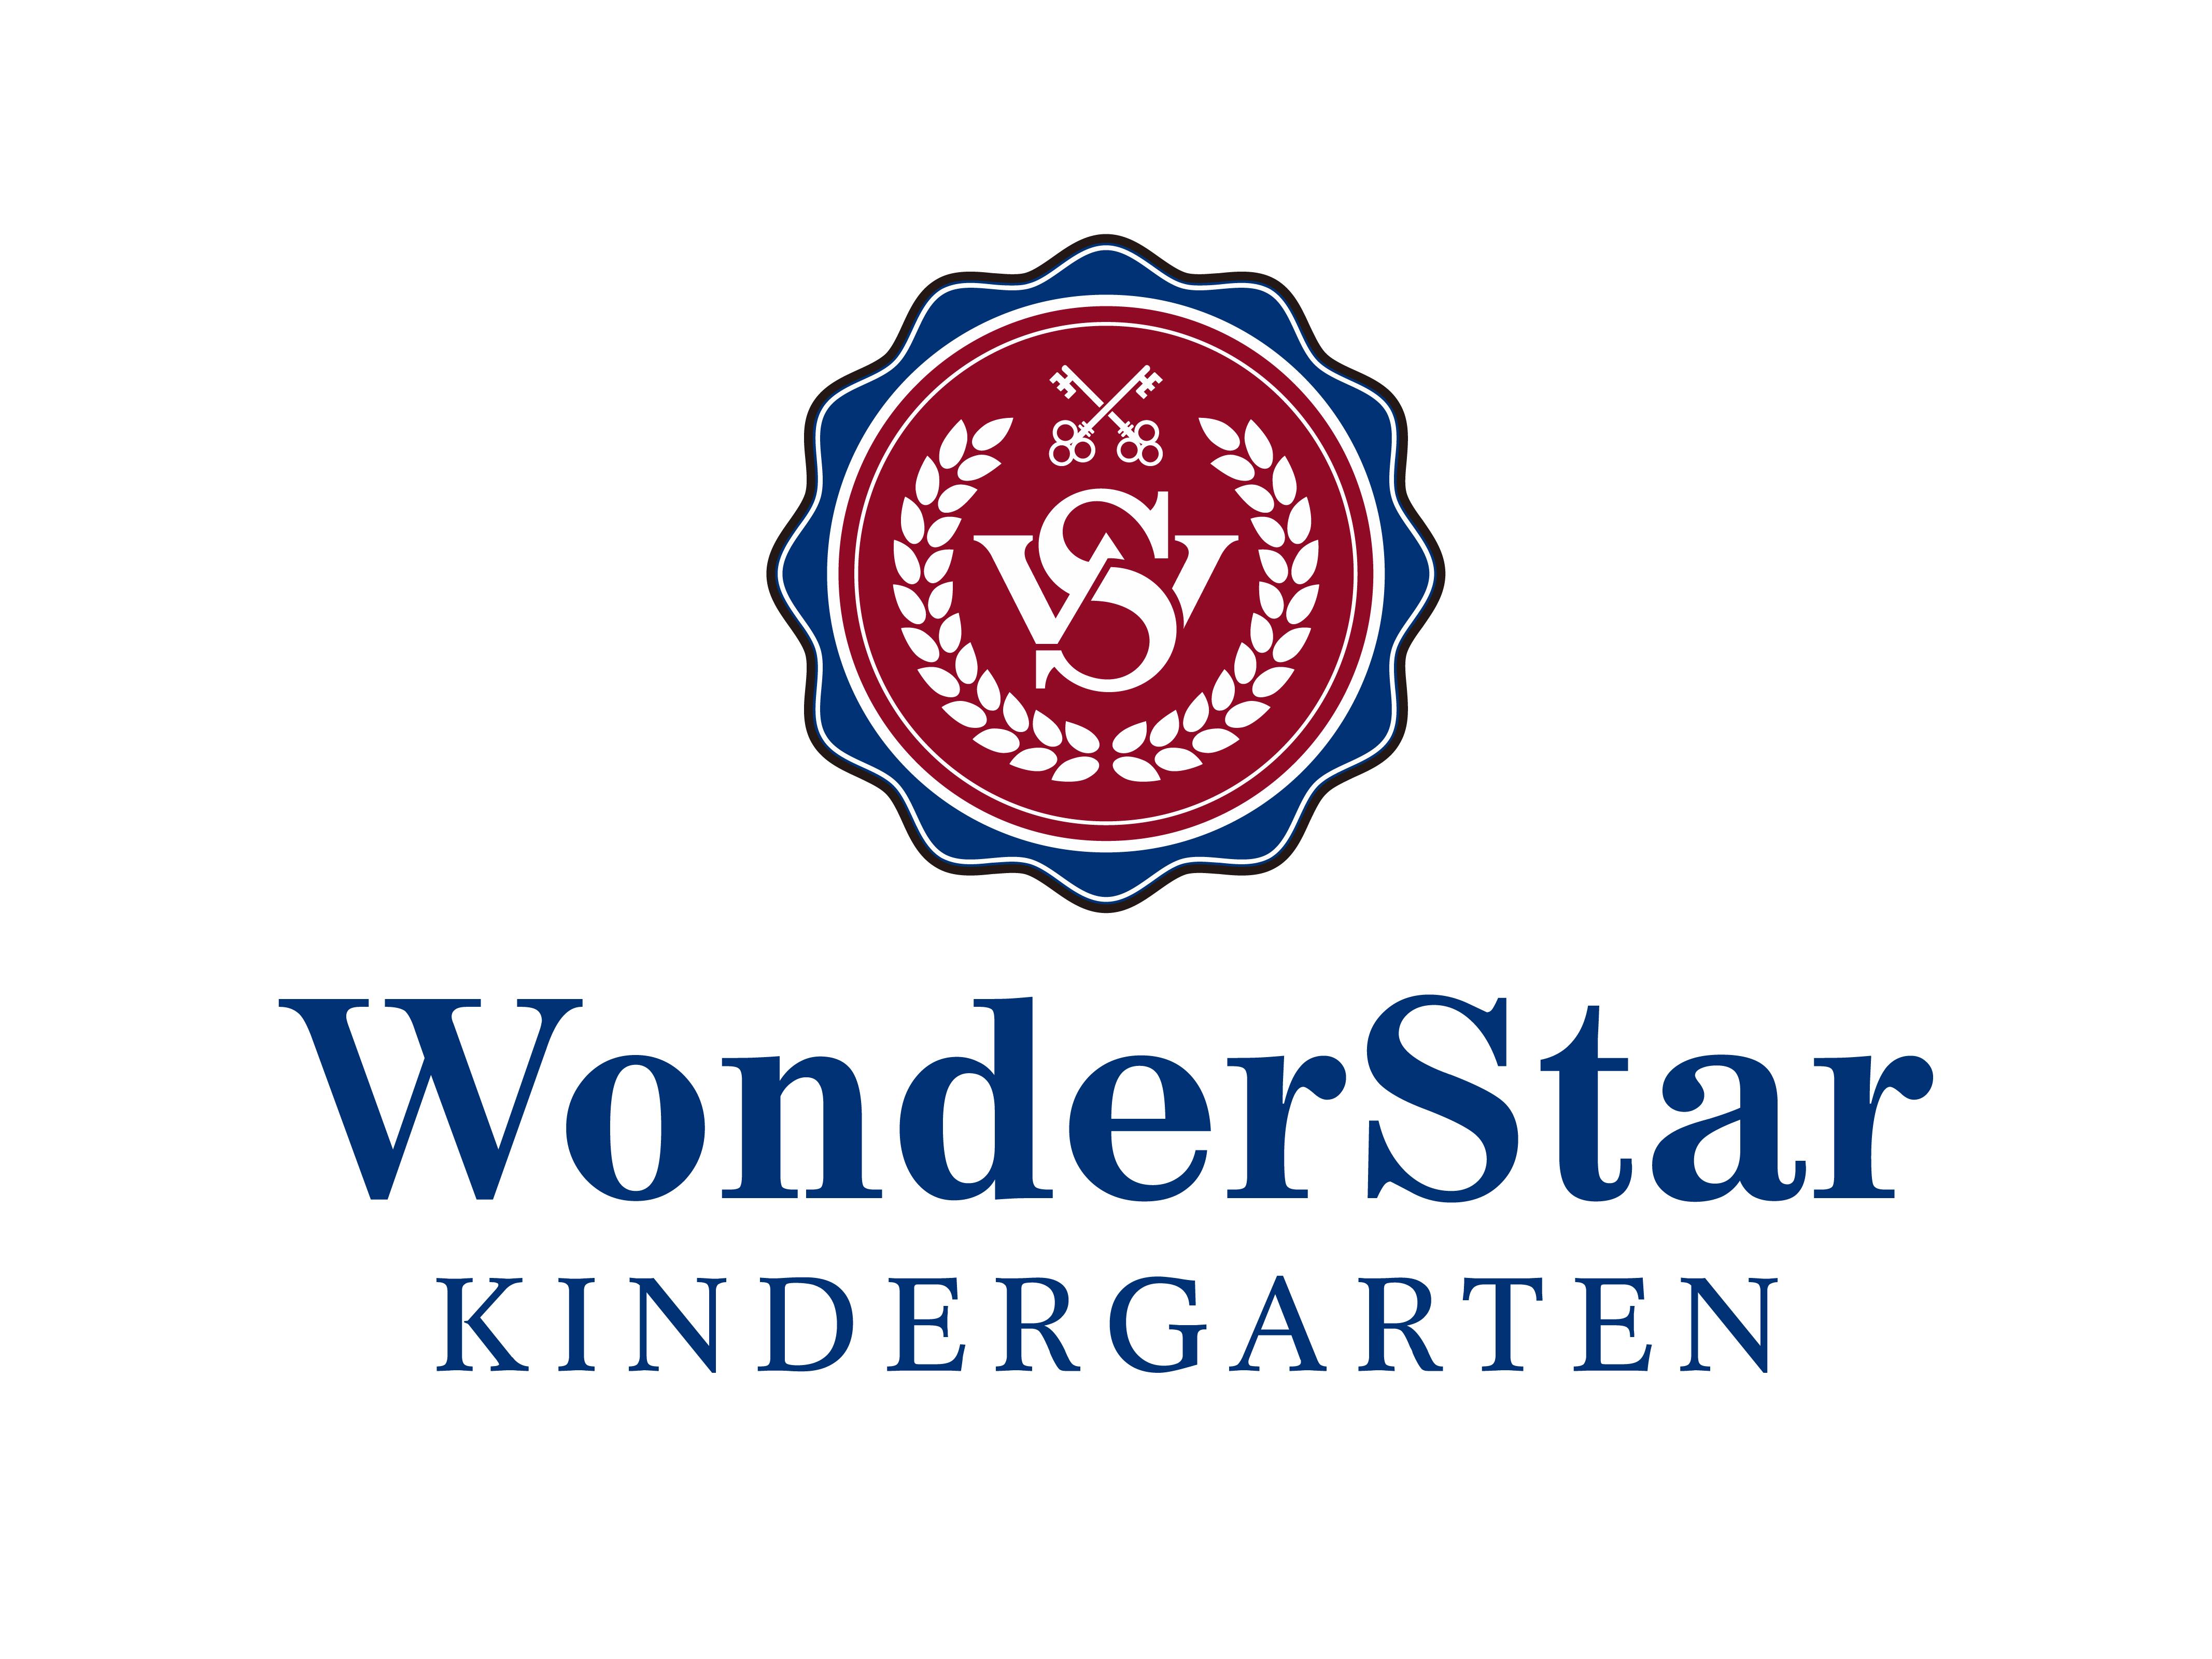 Wonderstar International